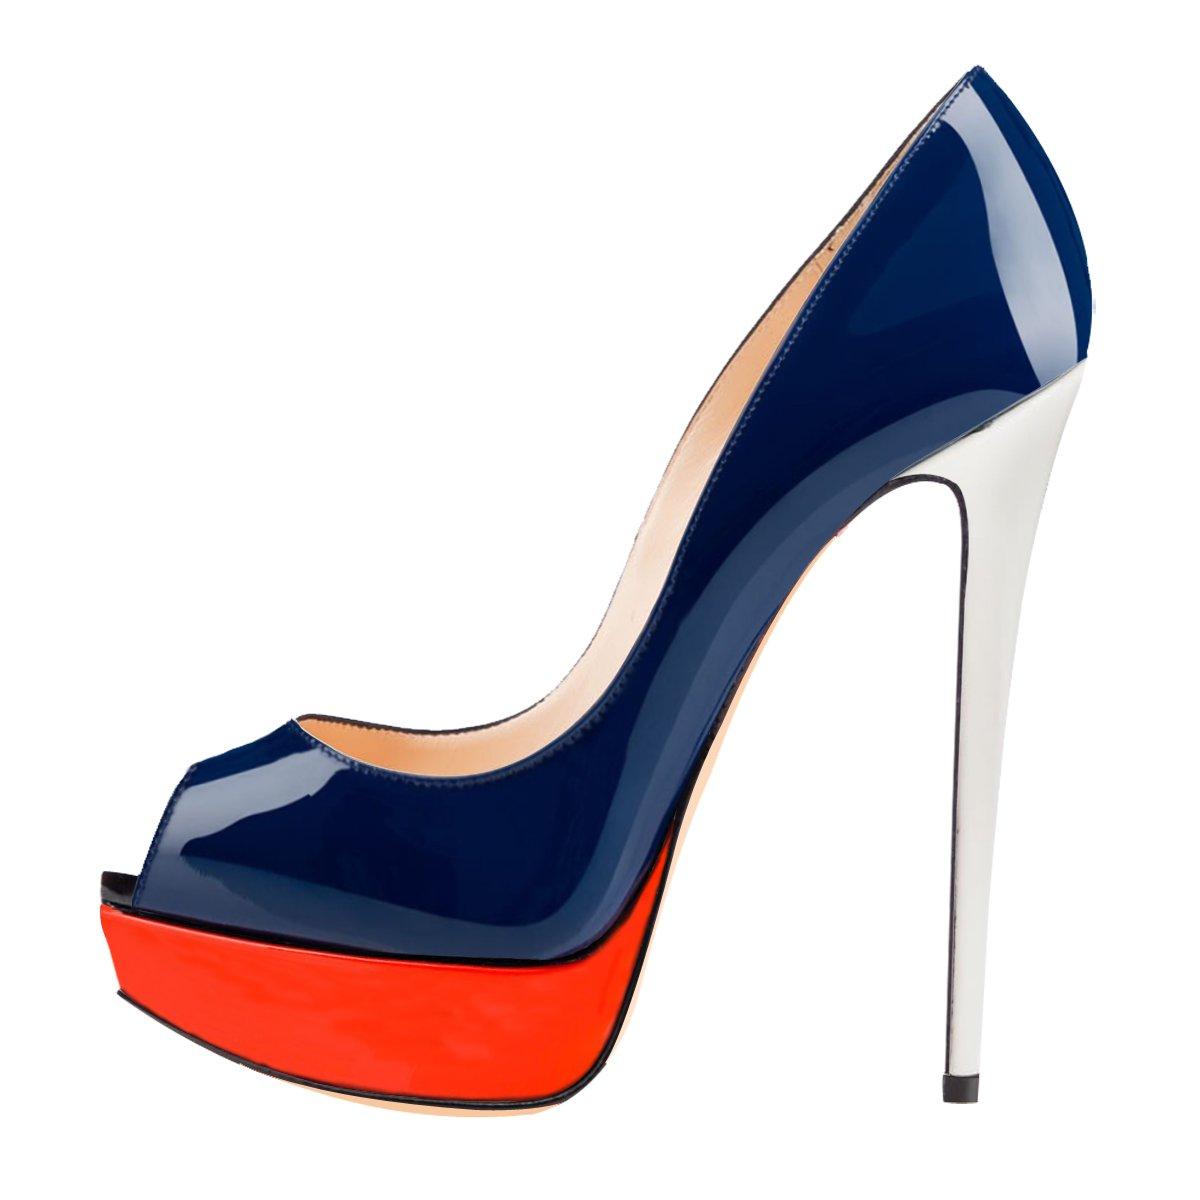 Onlymaker Damenschuhe High Heels Pumps Peep Toe Stiletto Plateau Absatz Lackleder  37 EU|Blau Und Orange